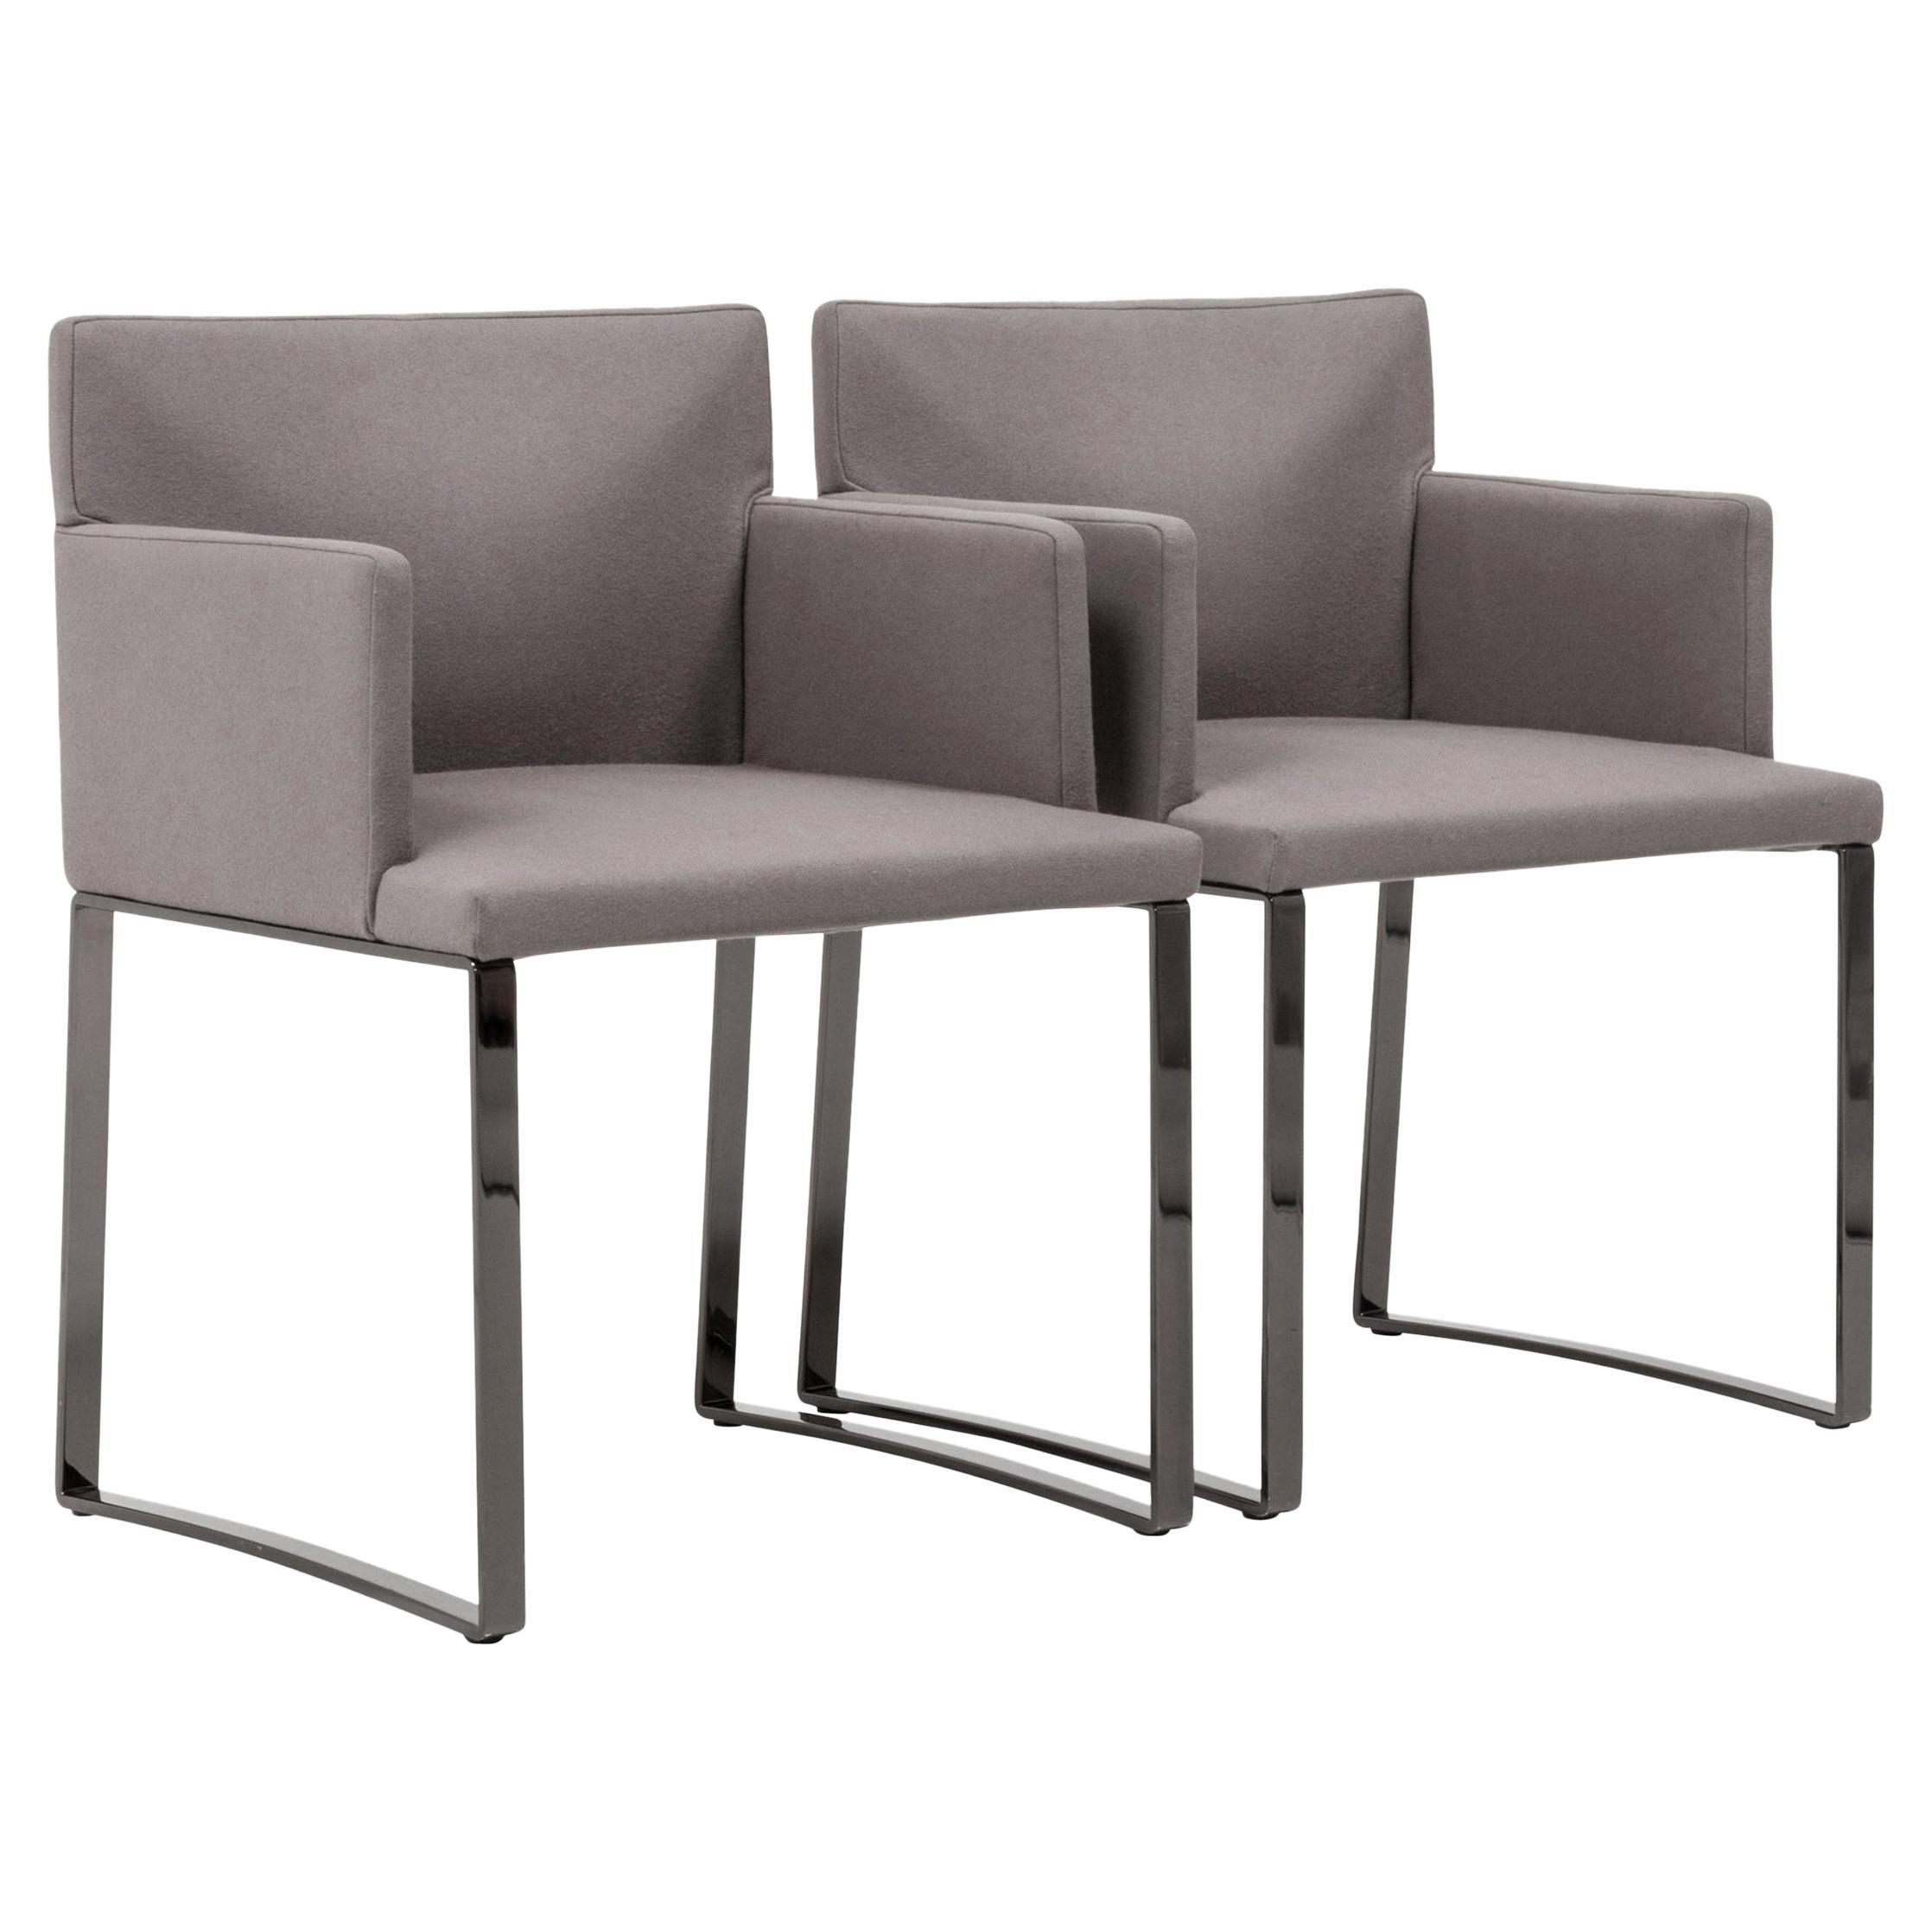 Minotti by Rodolfo Dordoni Modern Grey Wool Dining Chairs, Set of 2